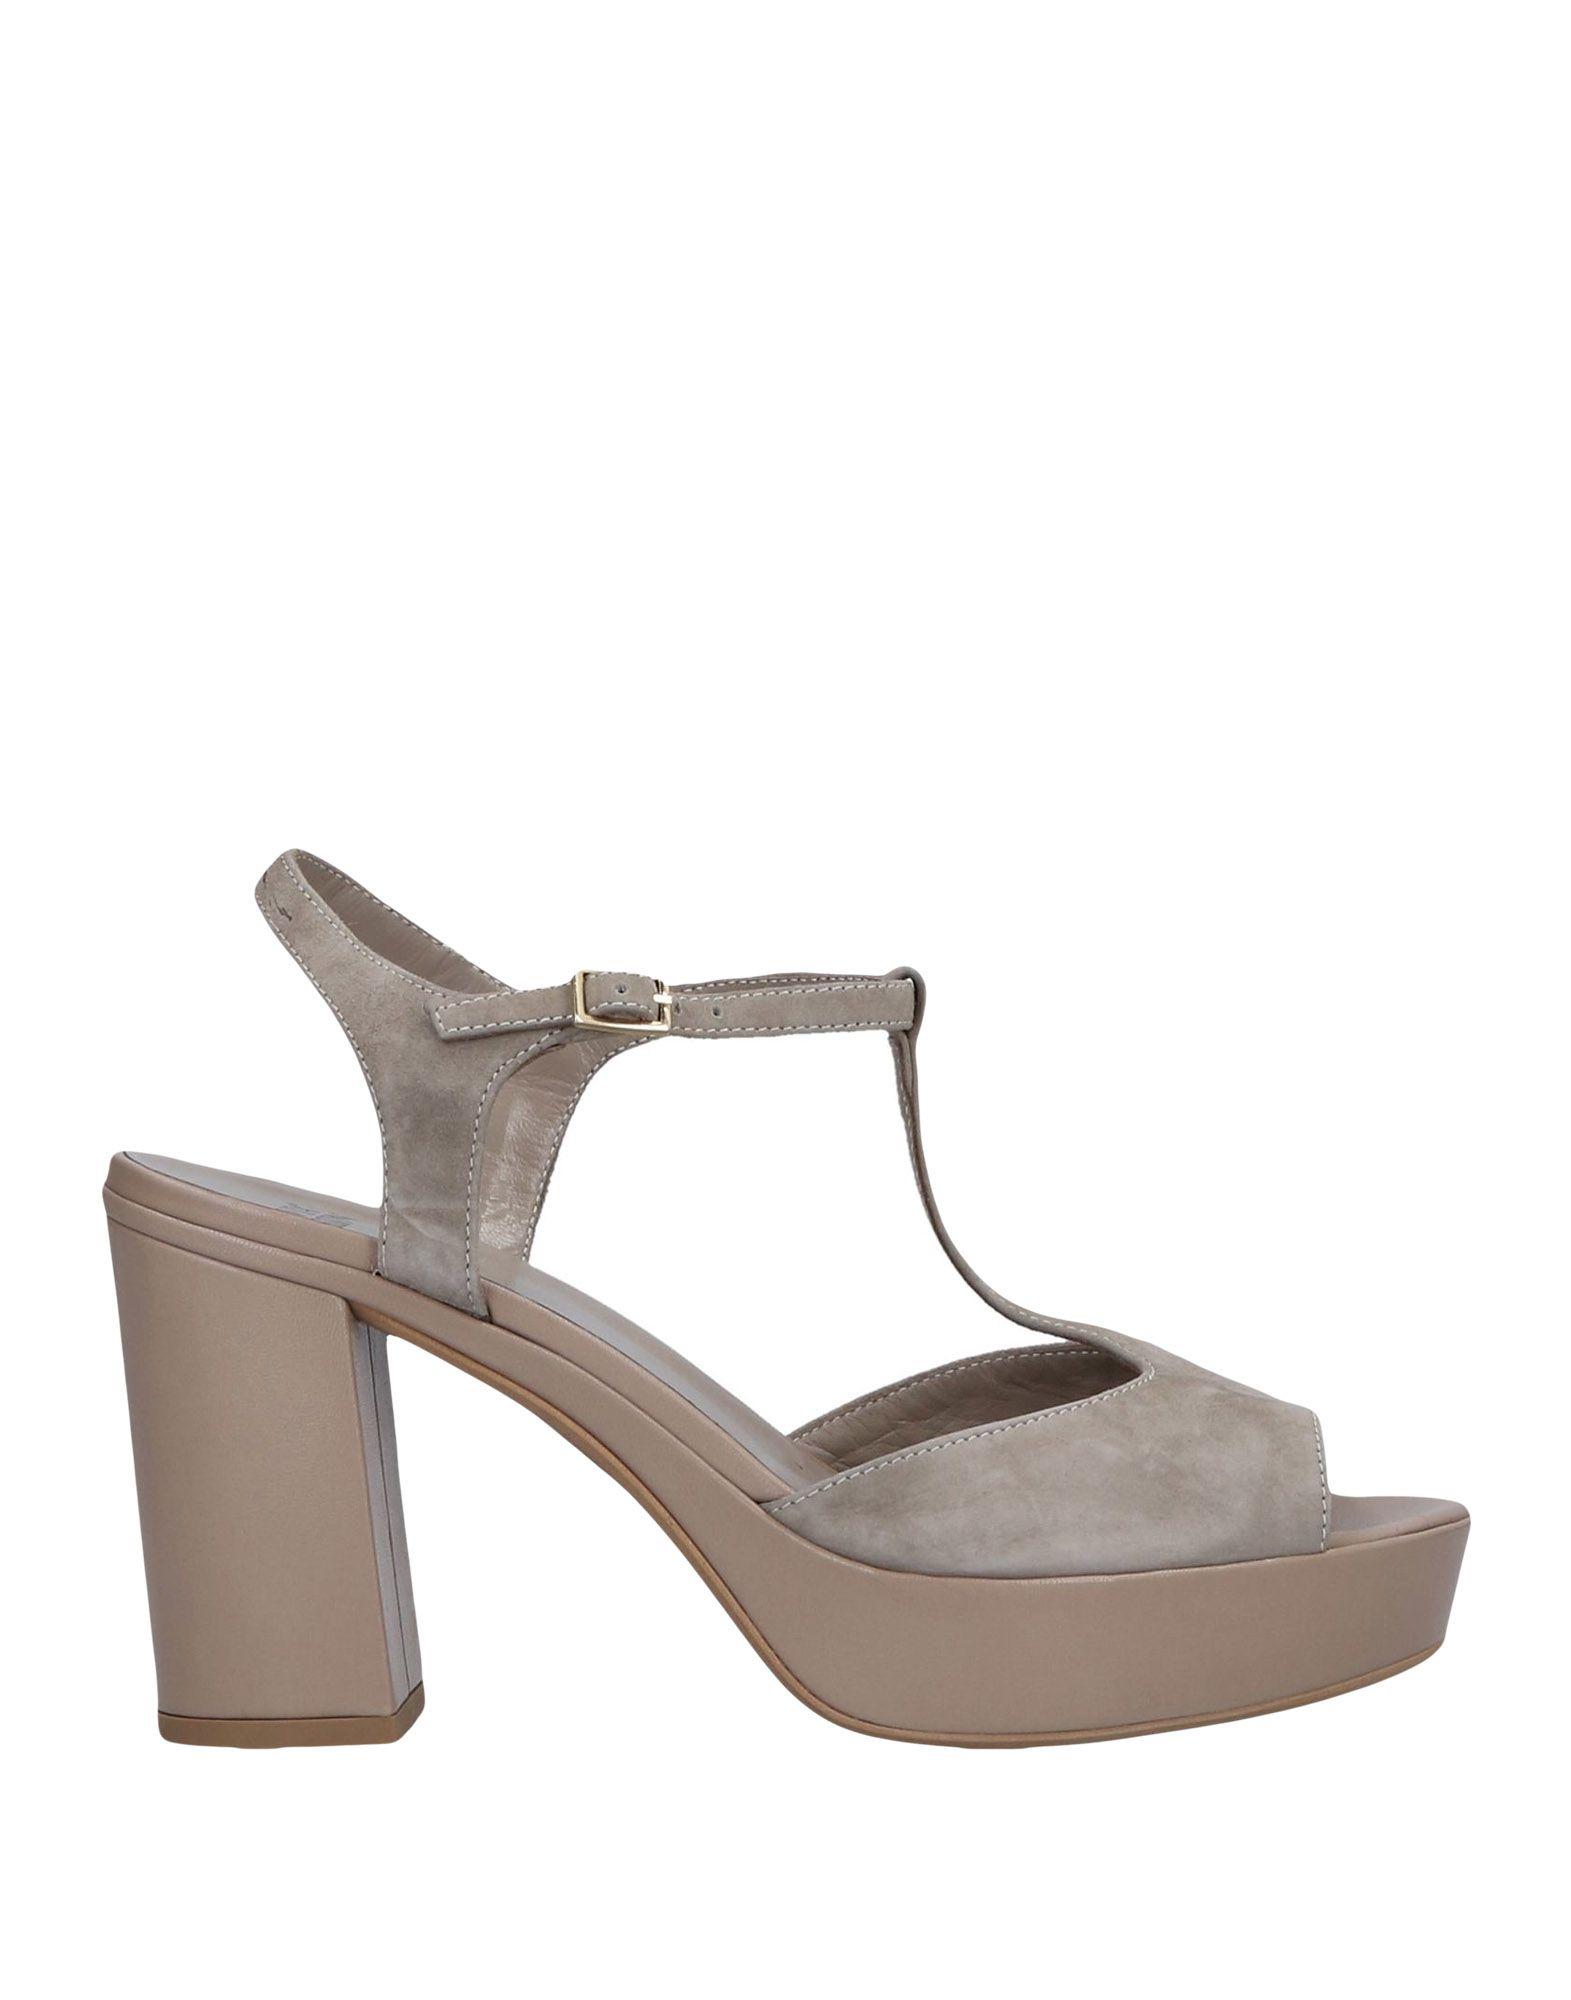 silvia rossini sandales sandales sandales - femmes silvia rossini sandales en ligne sur canada - 11517777qp 54c965